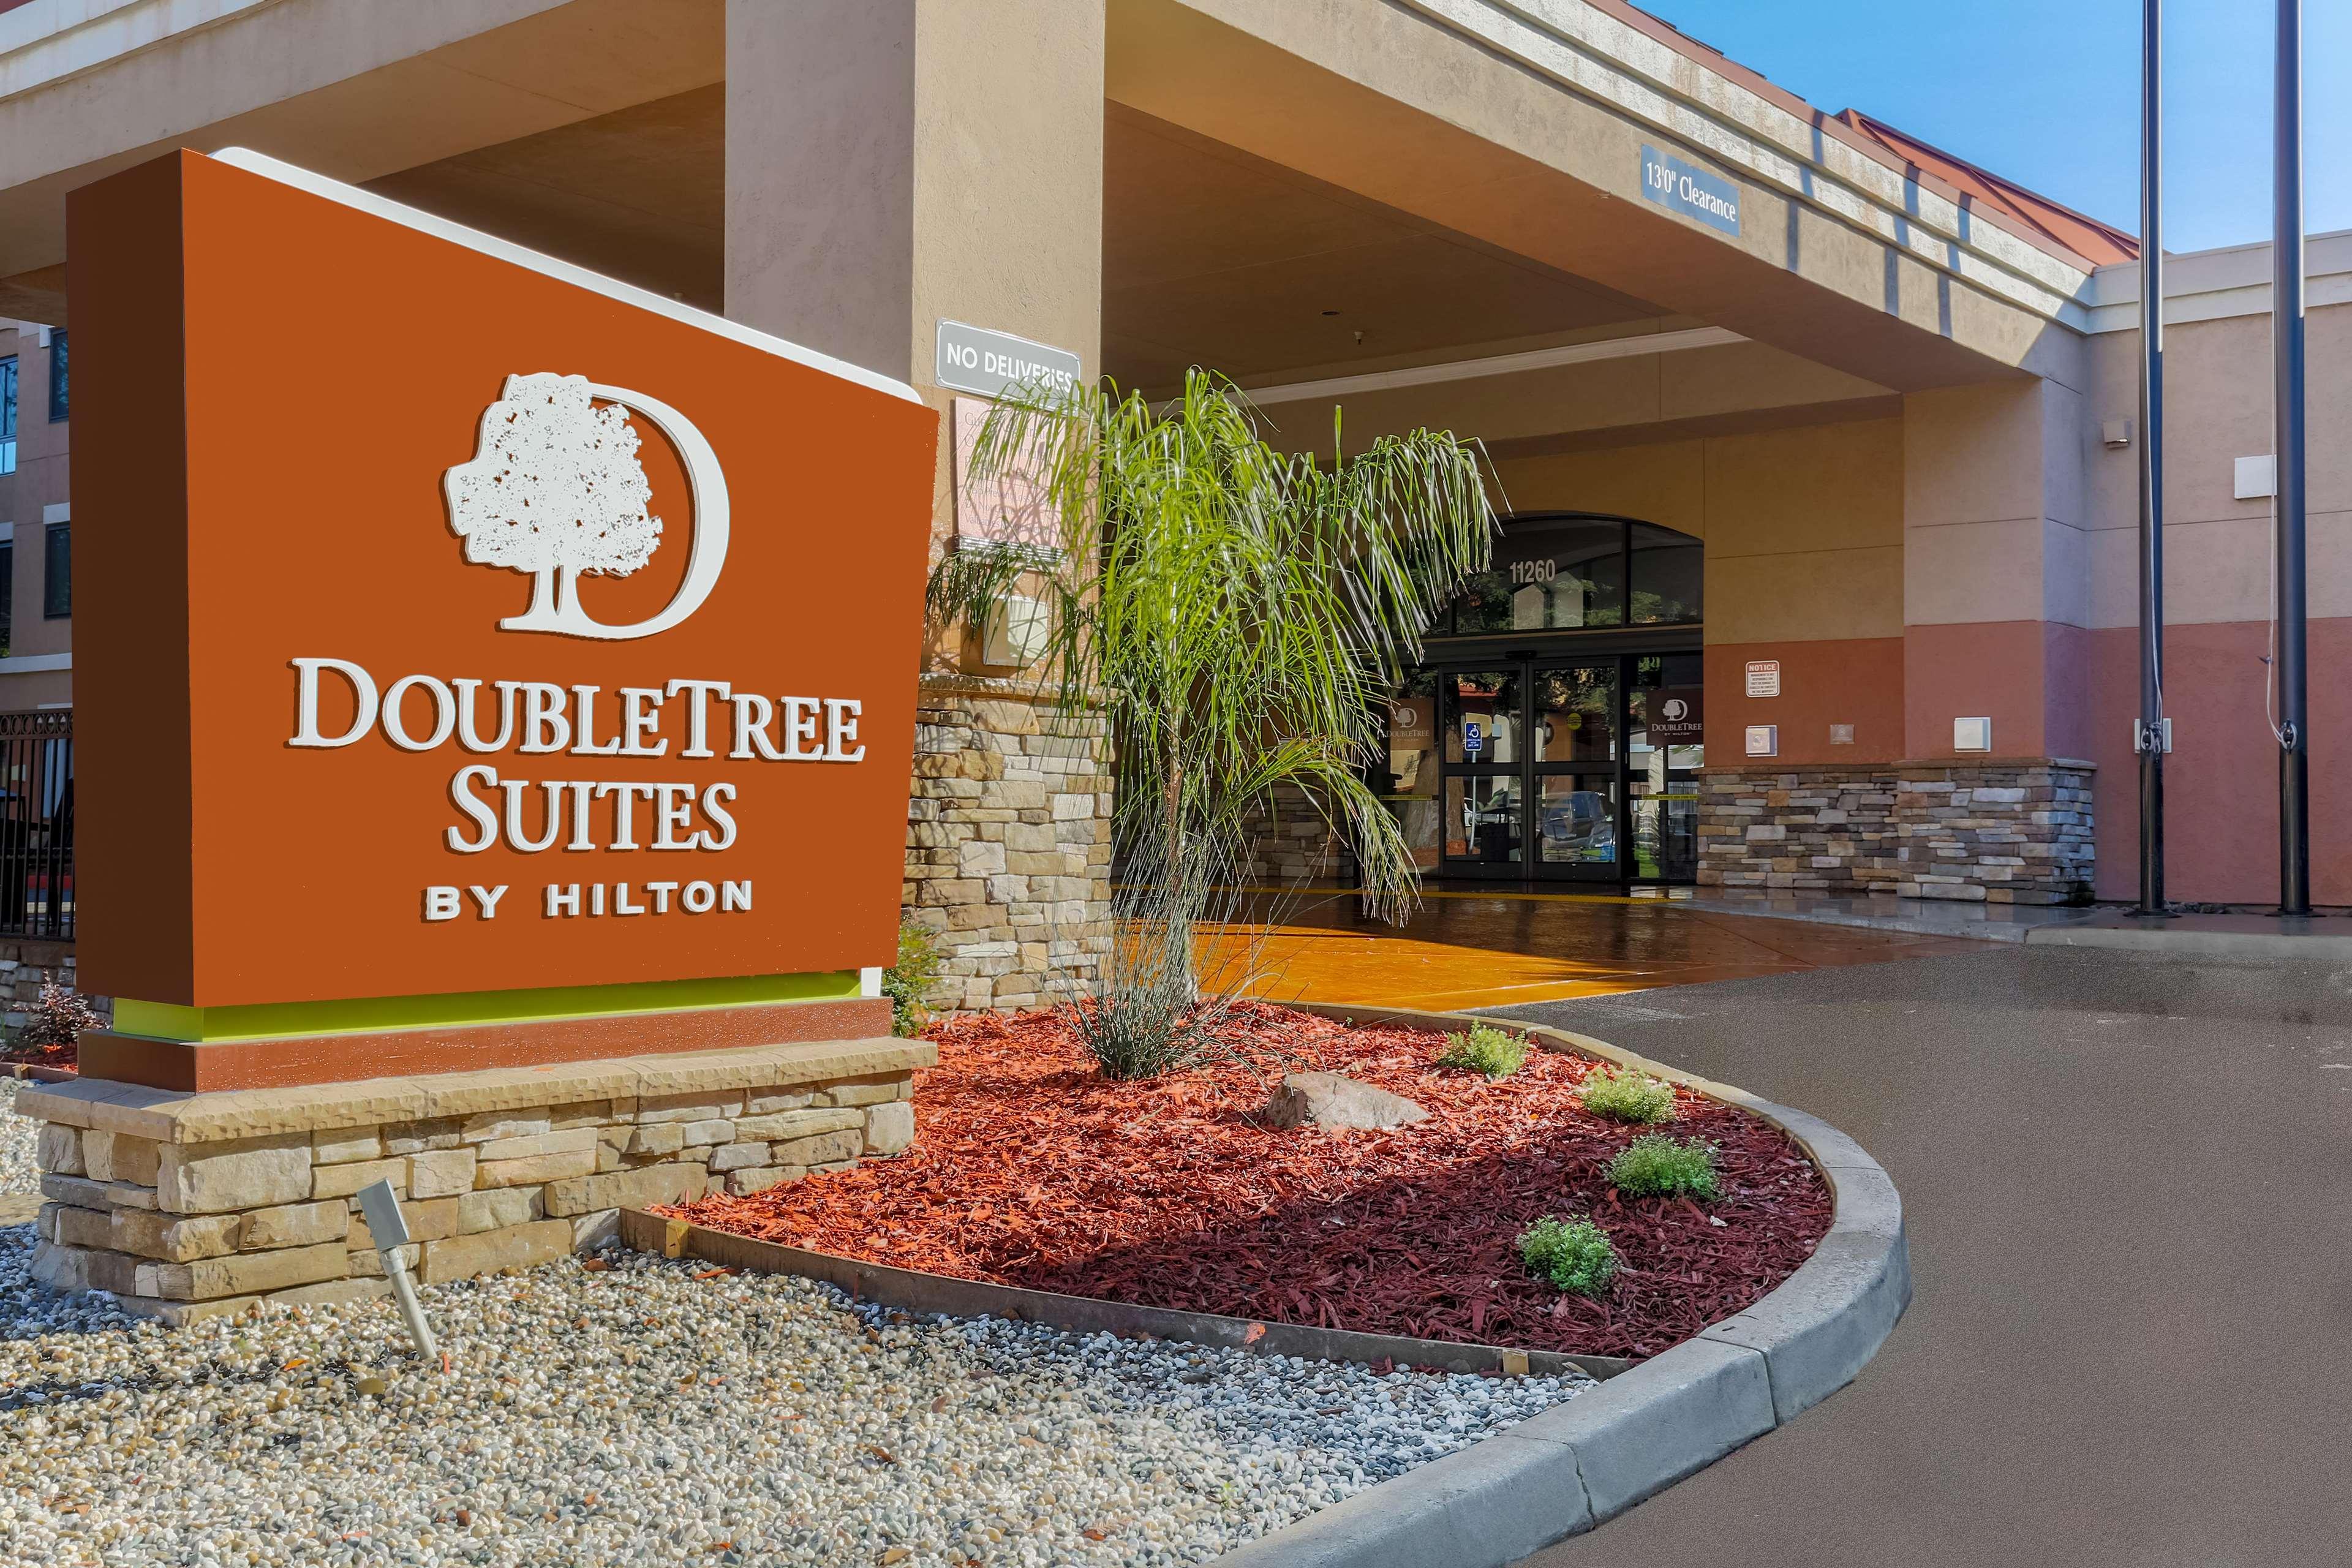 DoubleTree Suites by Hilton Hotel Sacramento - Rancho Cordova